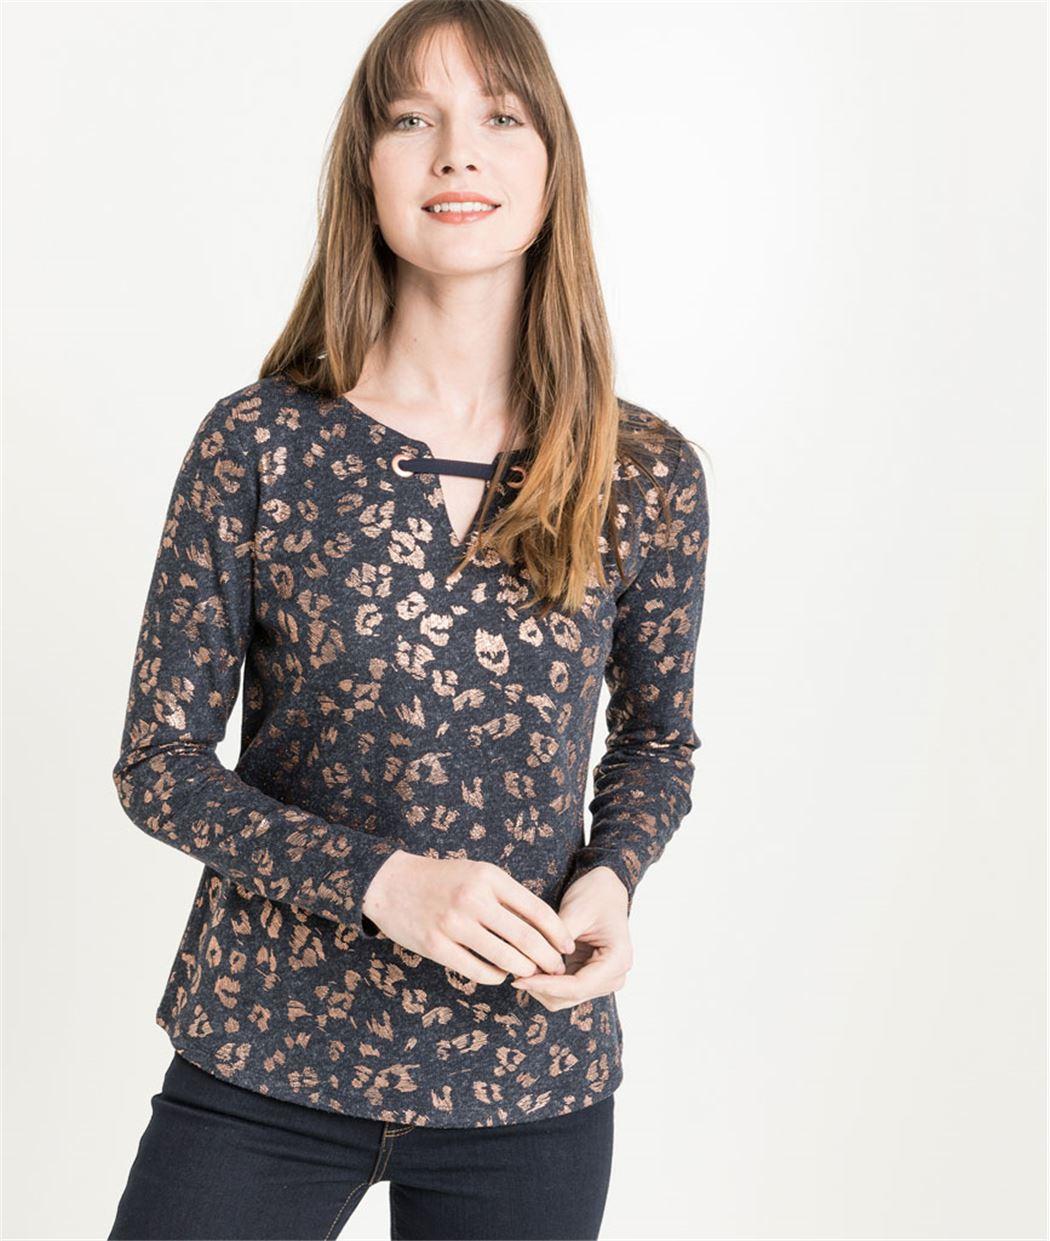 T-shirt femme manches longues léopard MARINE